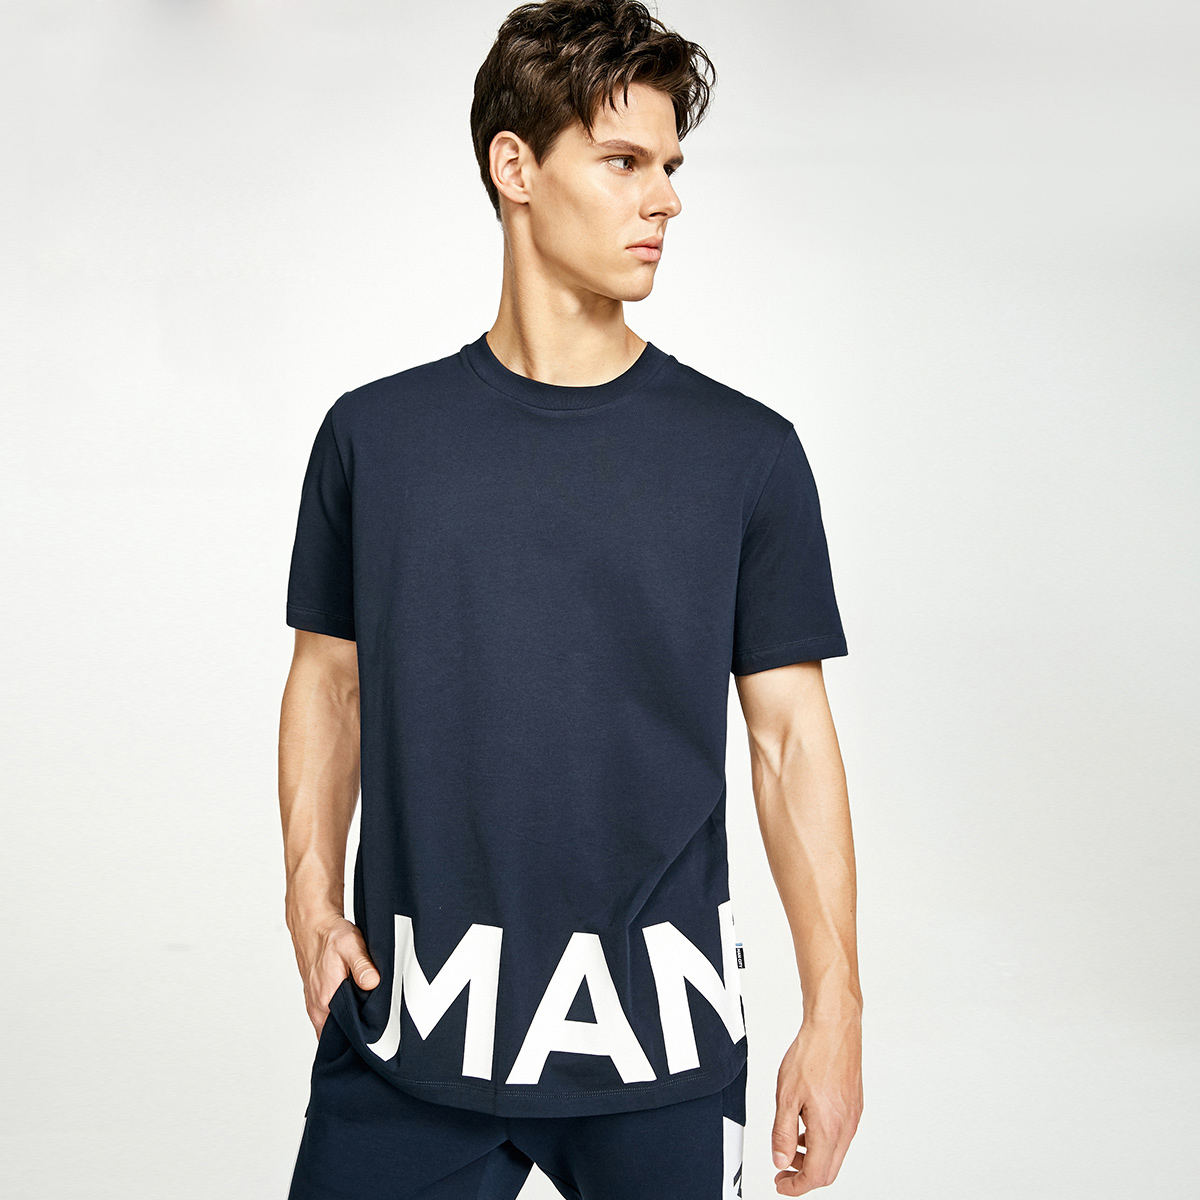 JackJones杰克琼斯足球俱乐部男短袖T恤C|217301549